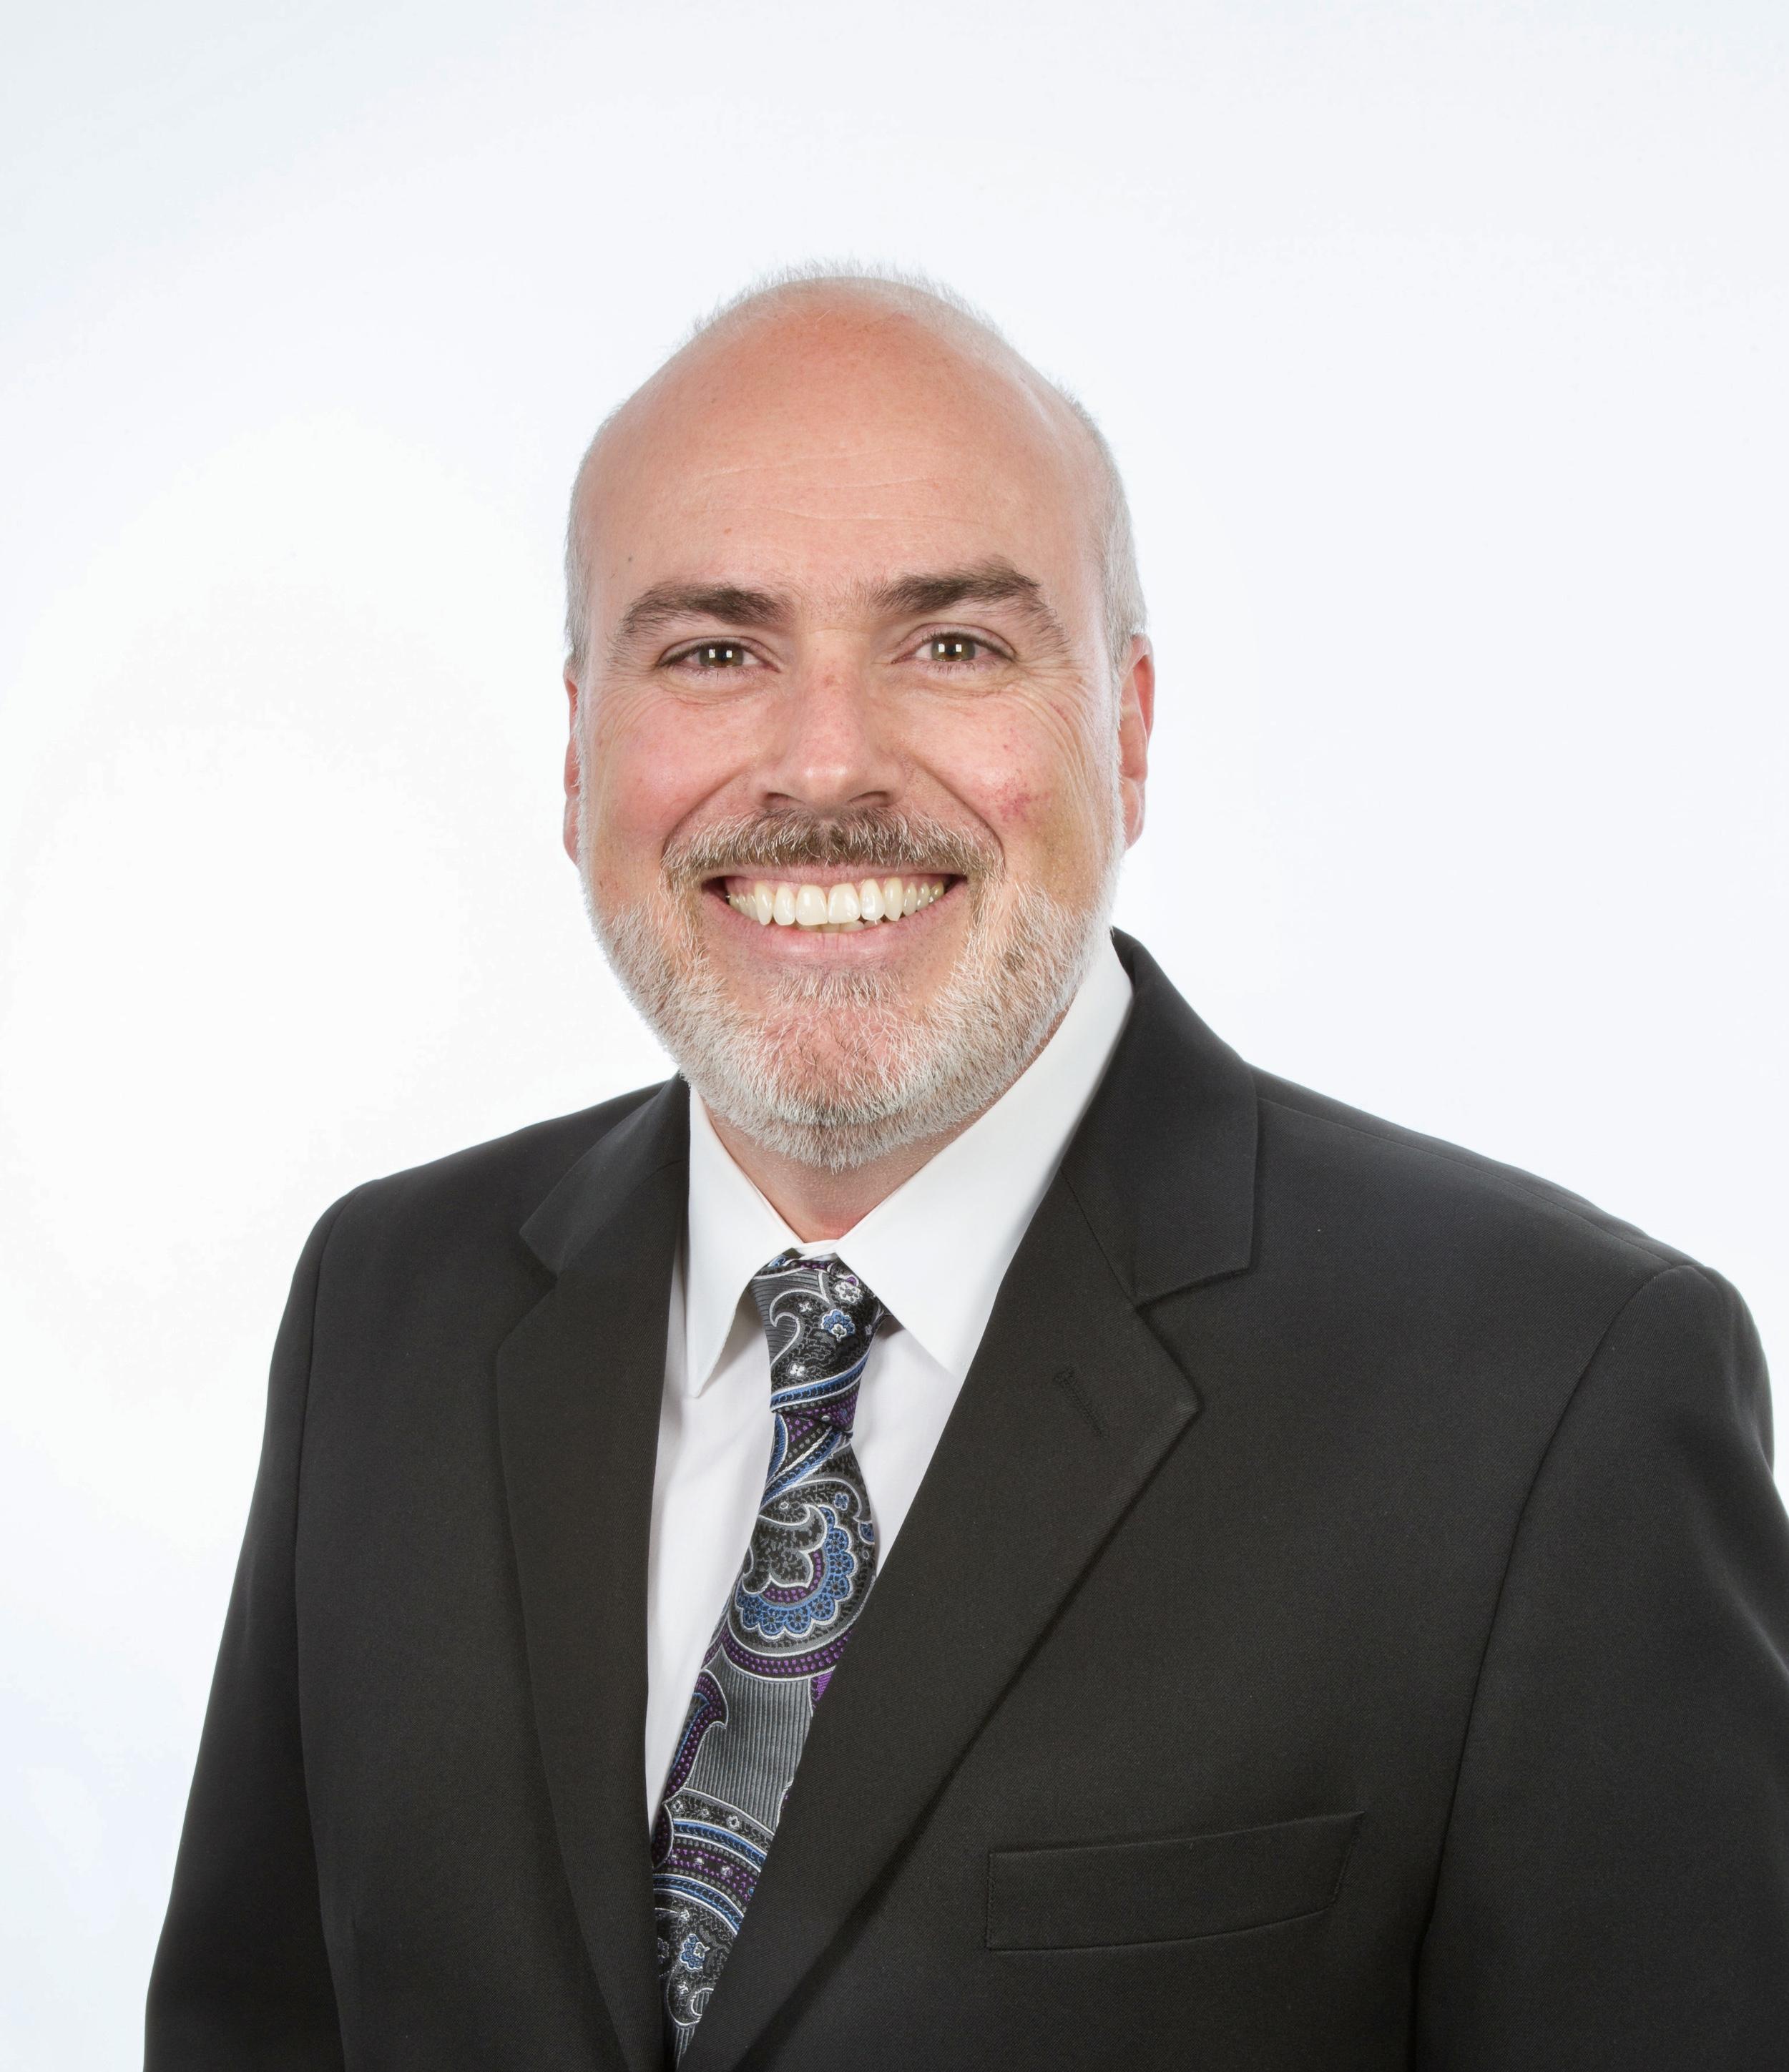 Dr.Carlos Spironelli Ramos